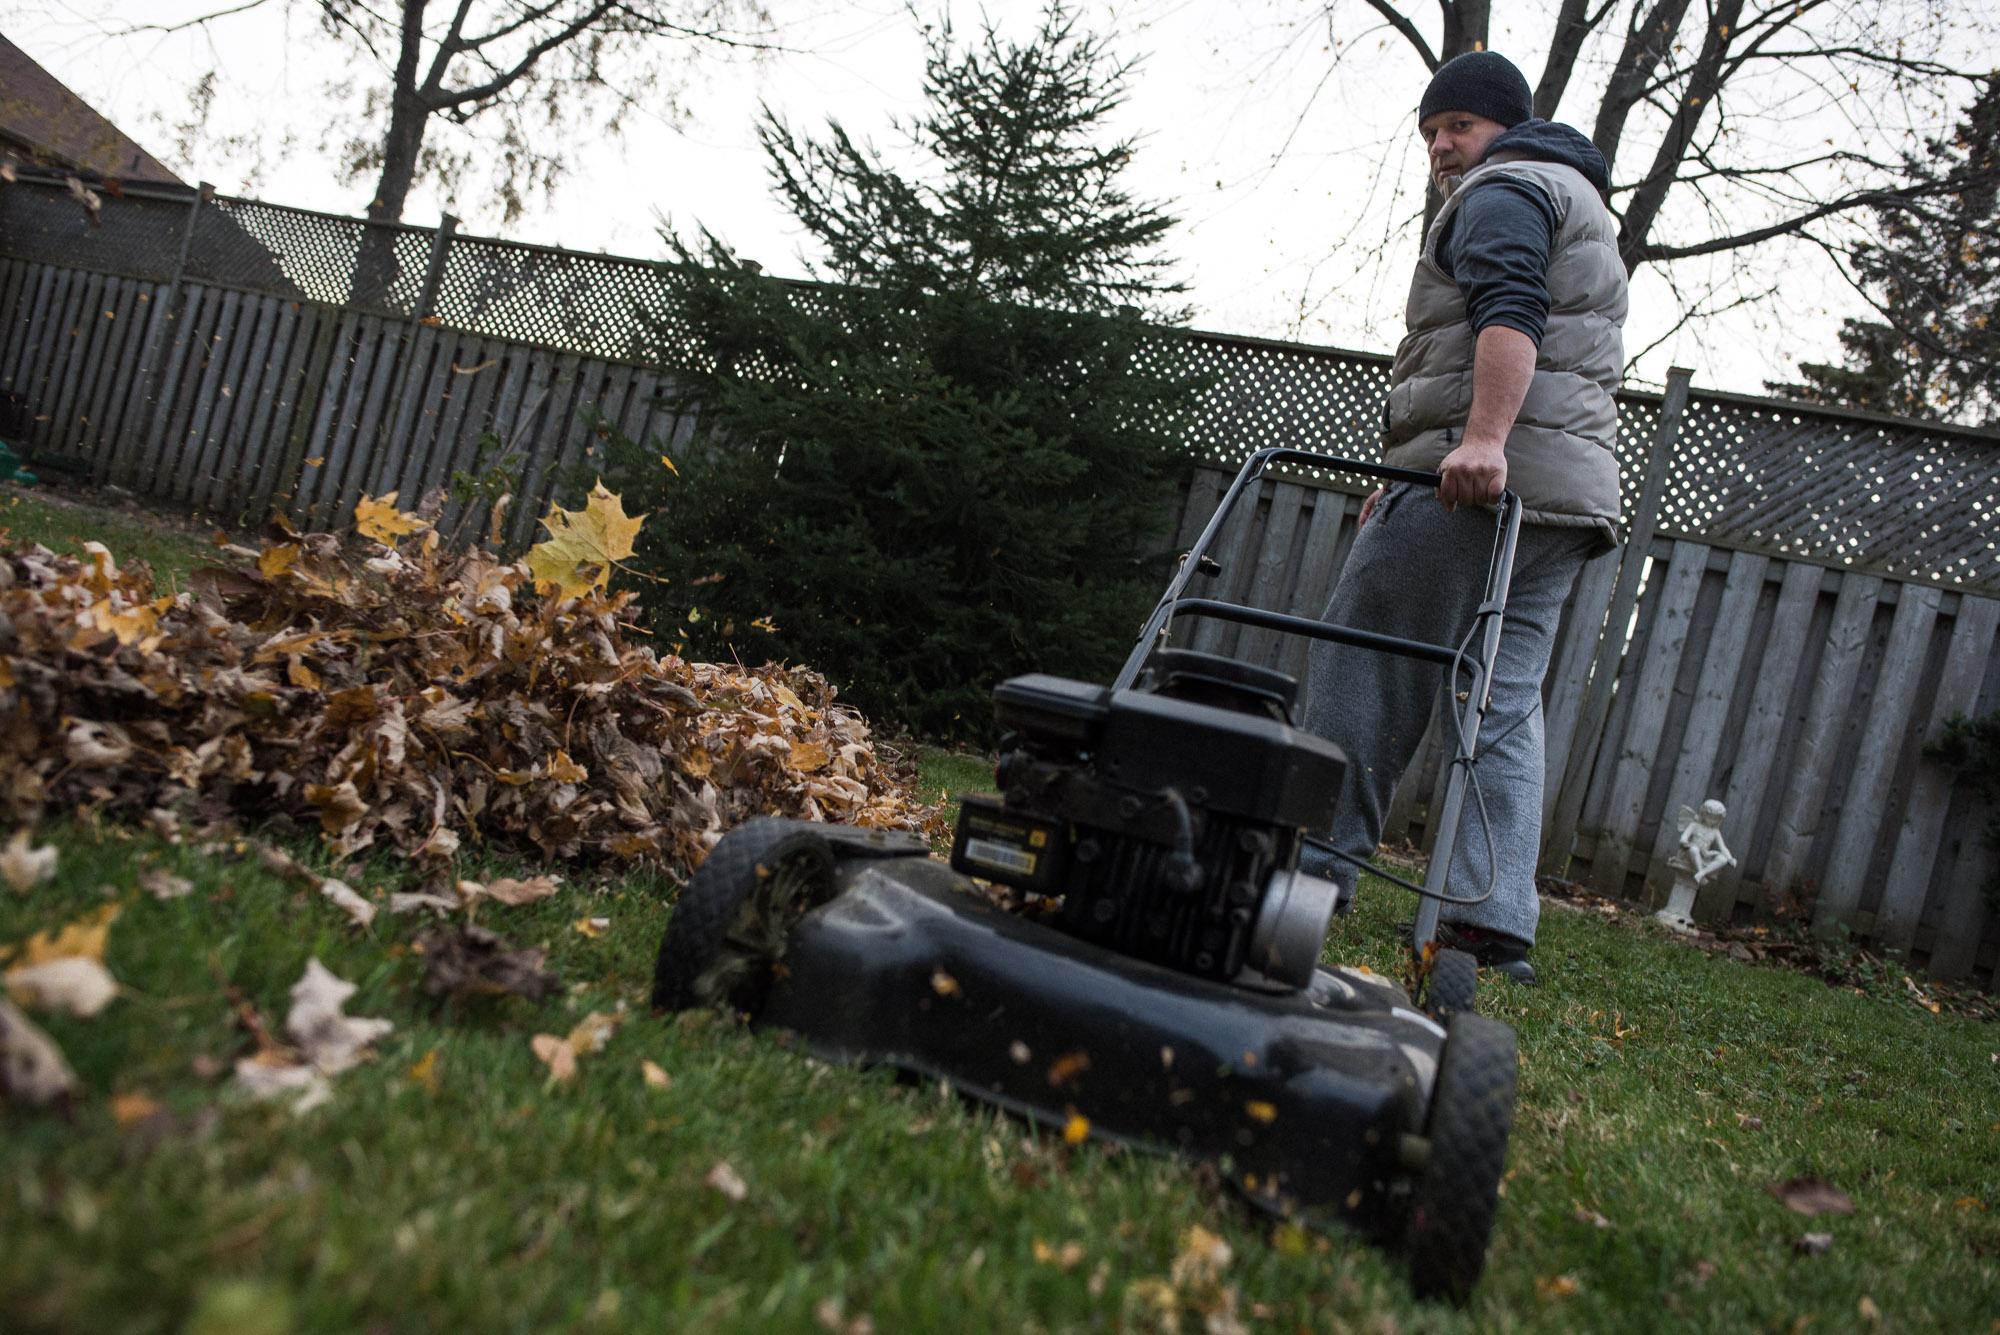 dad pulls on lawnmower